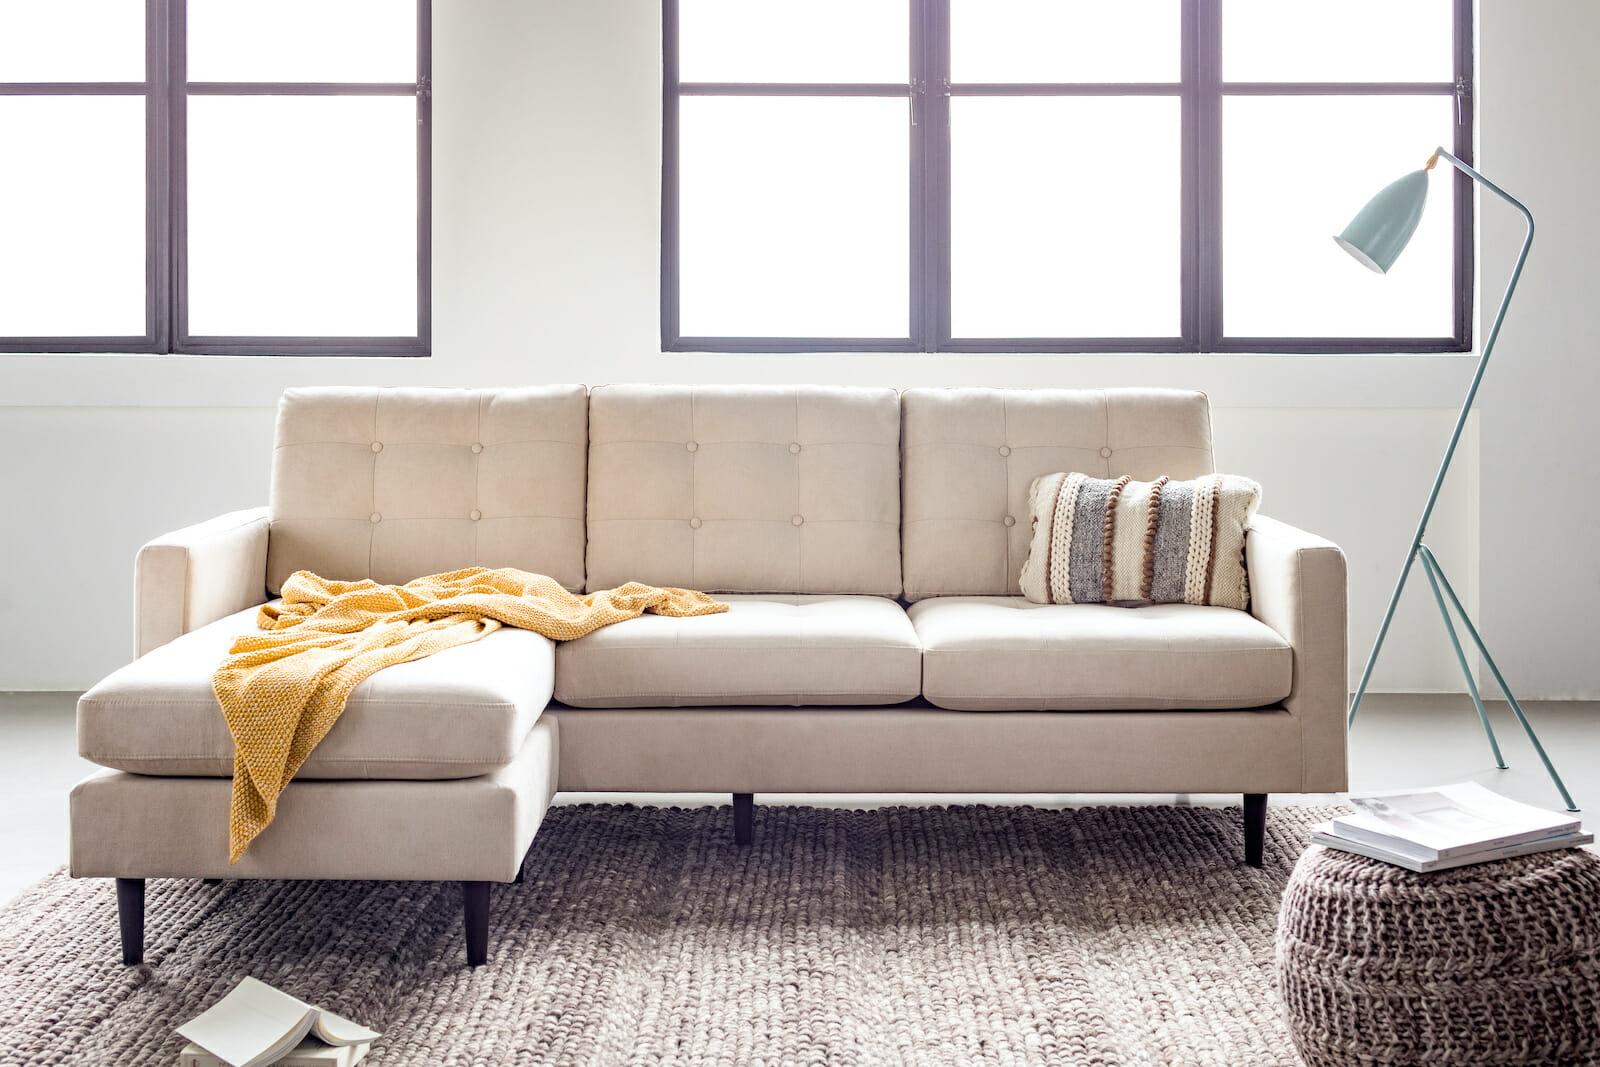 Noa madison sectional sofa